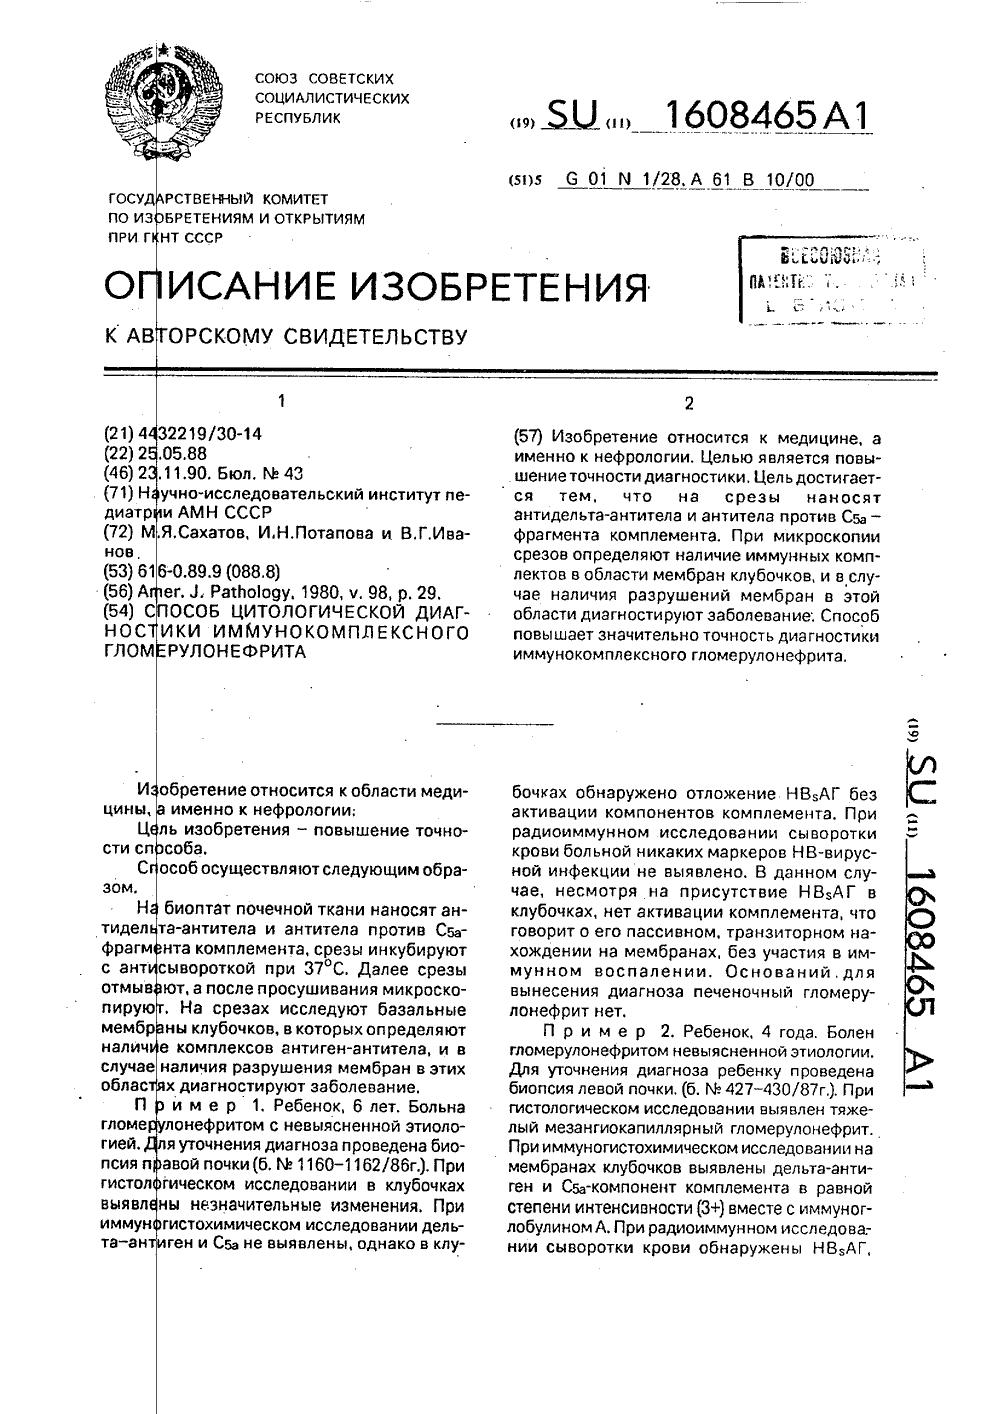 Холангиолит